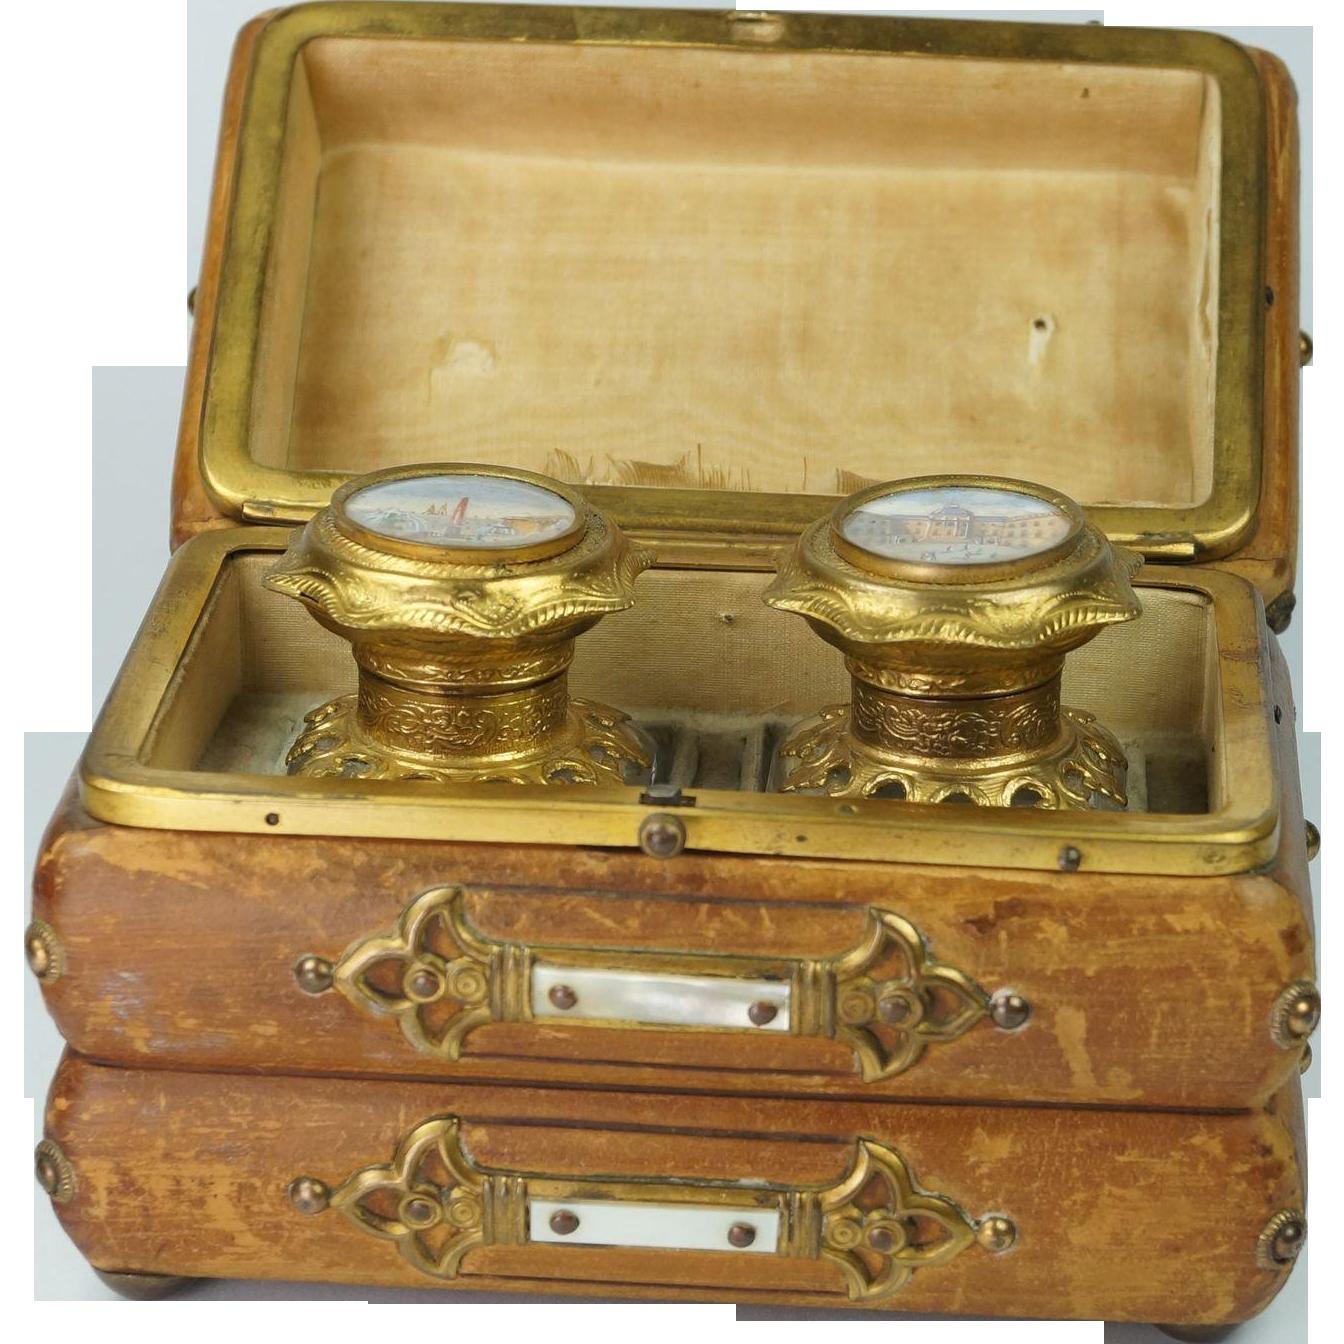 Antique French Scent Casket Perfume Caddy Grand Tour Views of Paris Circa 1850